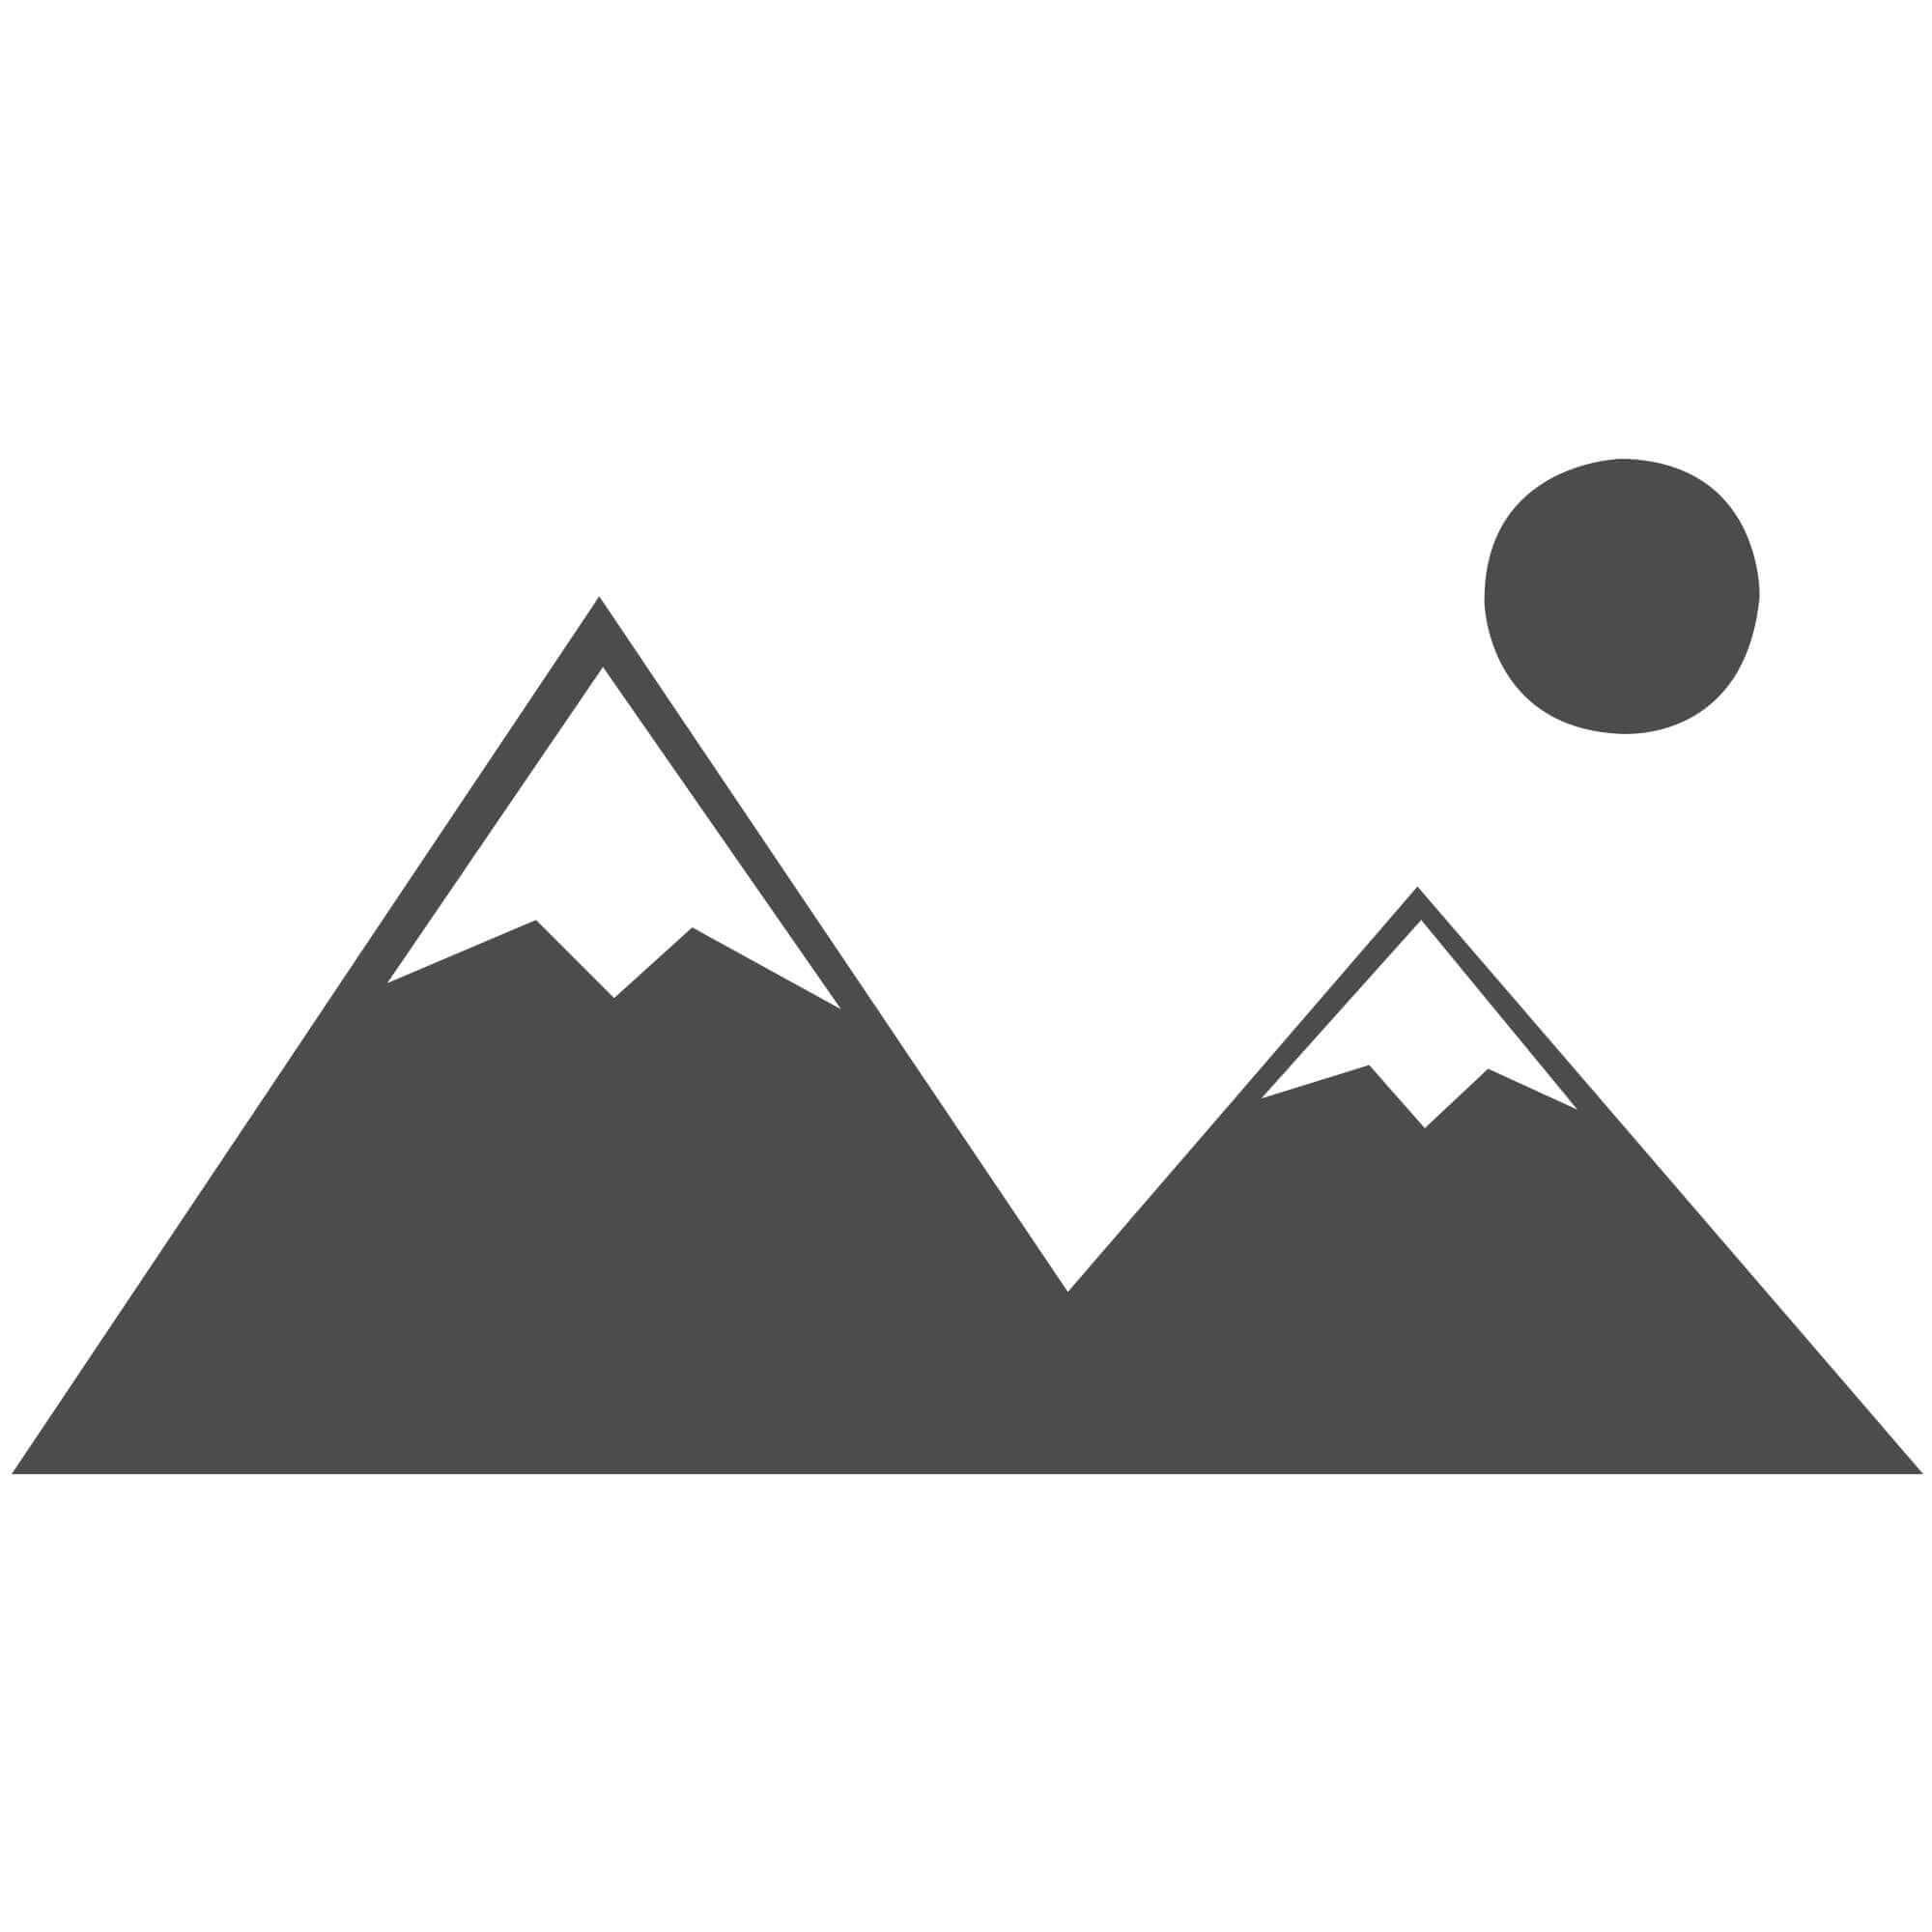 Steel Shear Metalworking New Zealand: Hydraulic Metal Shear